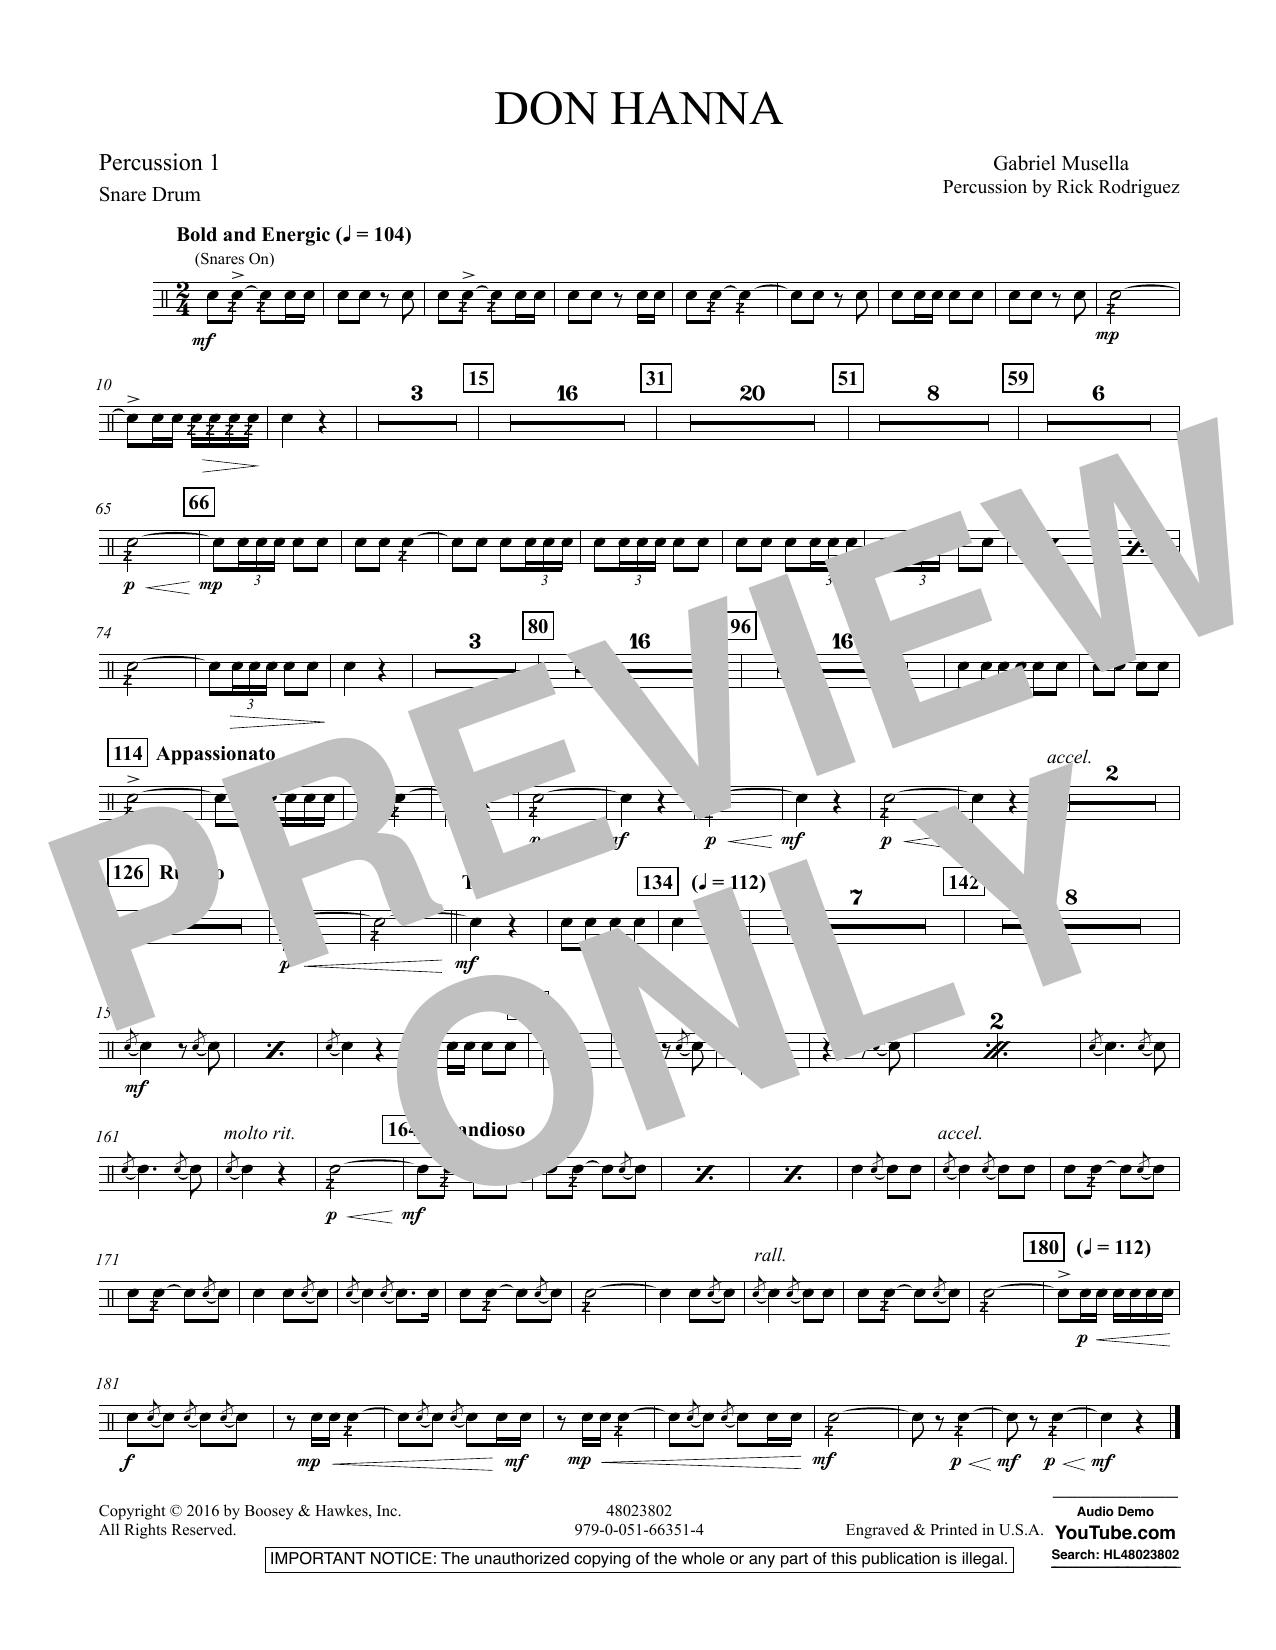 Don Hanna - Percussion 1